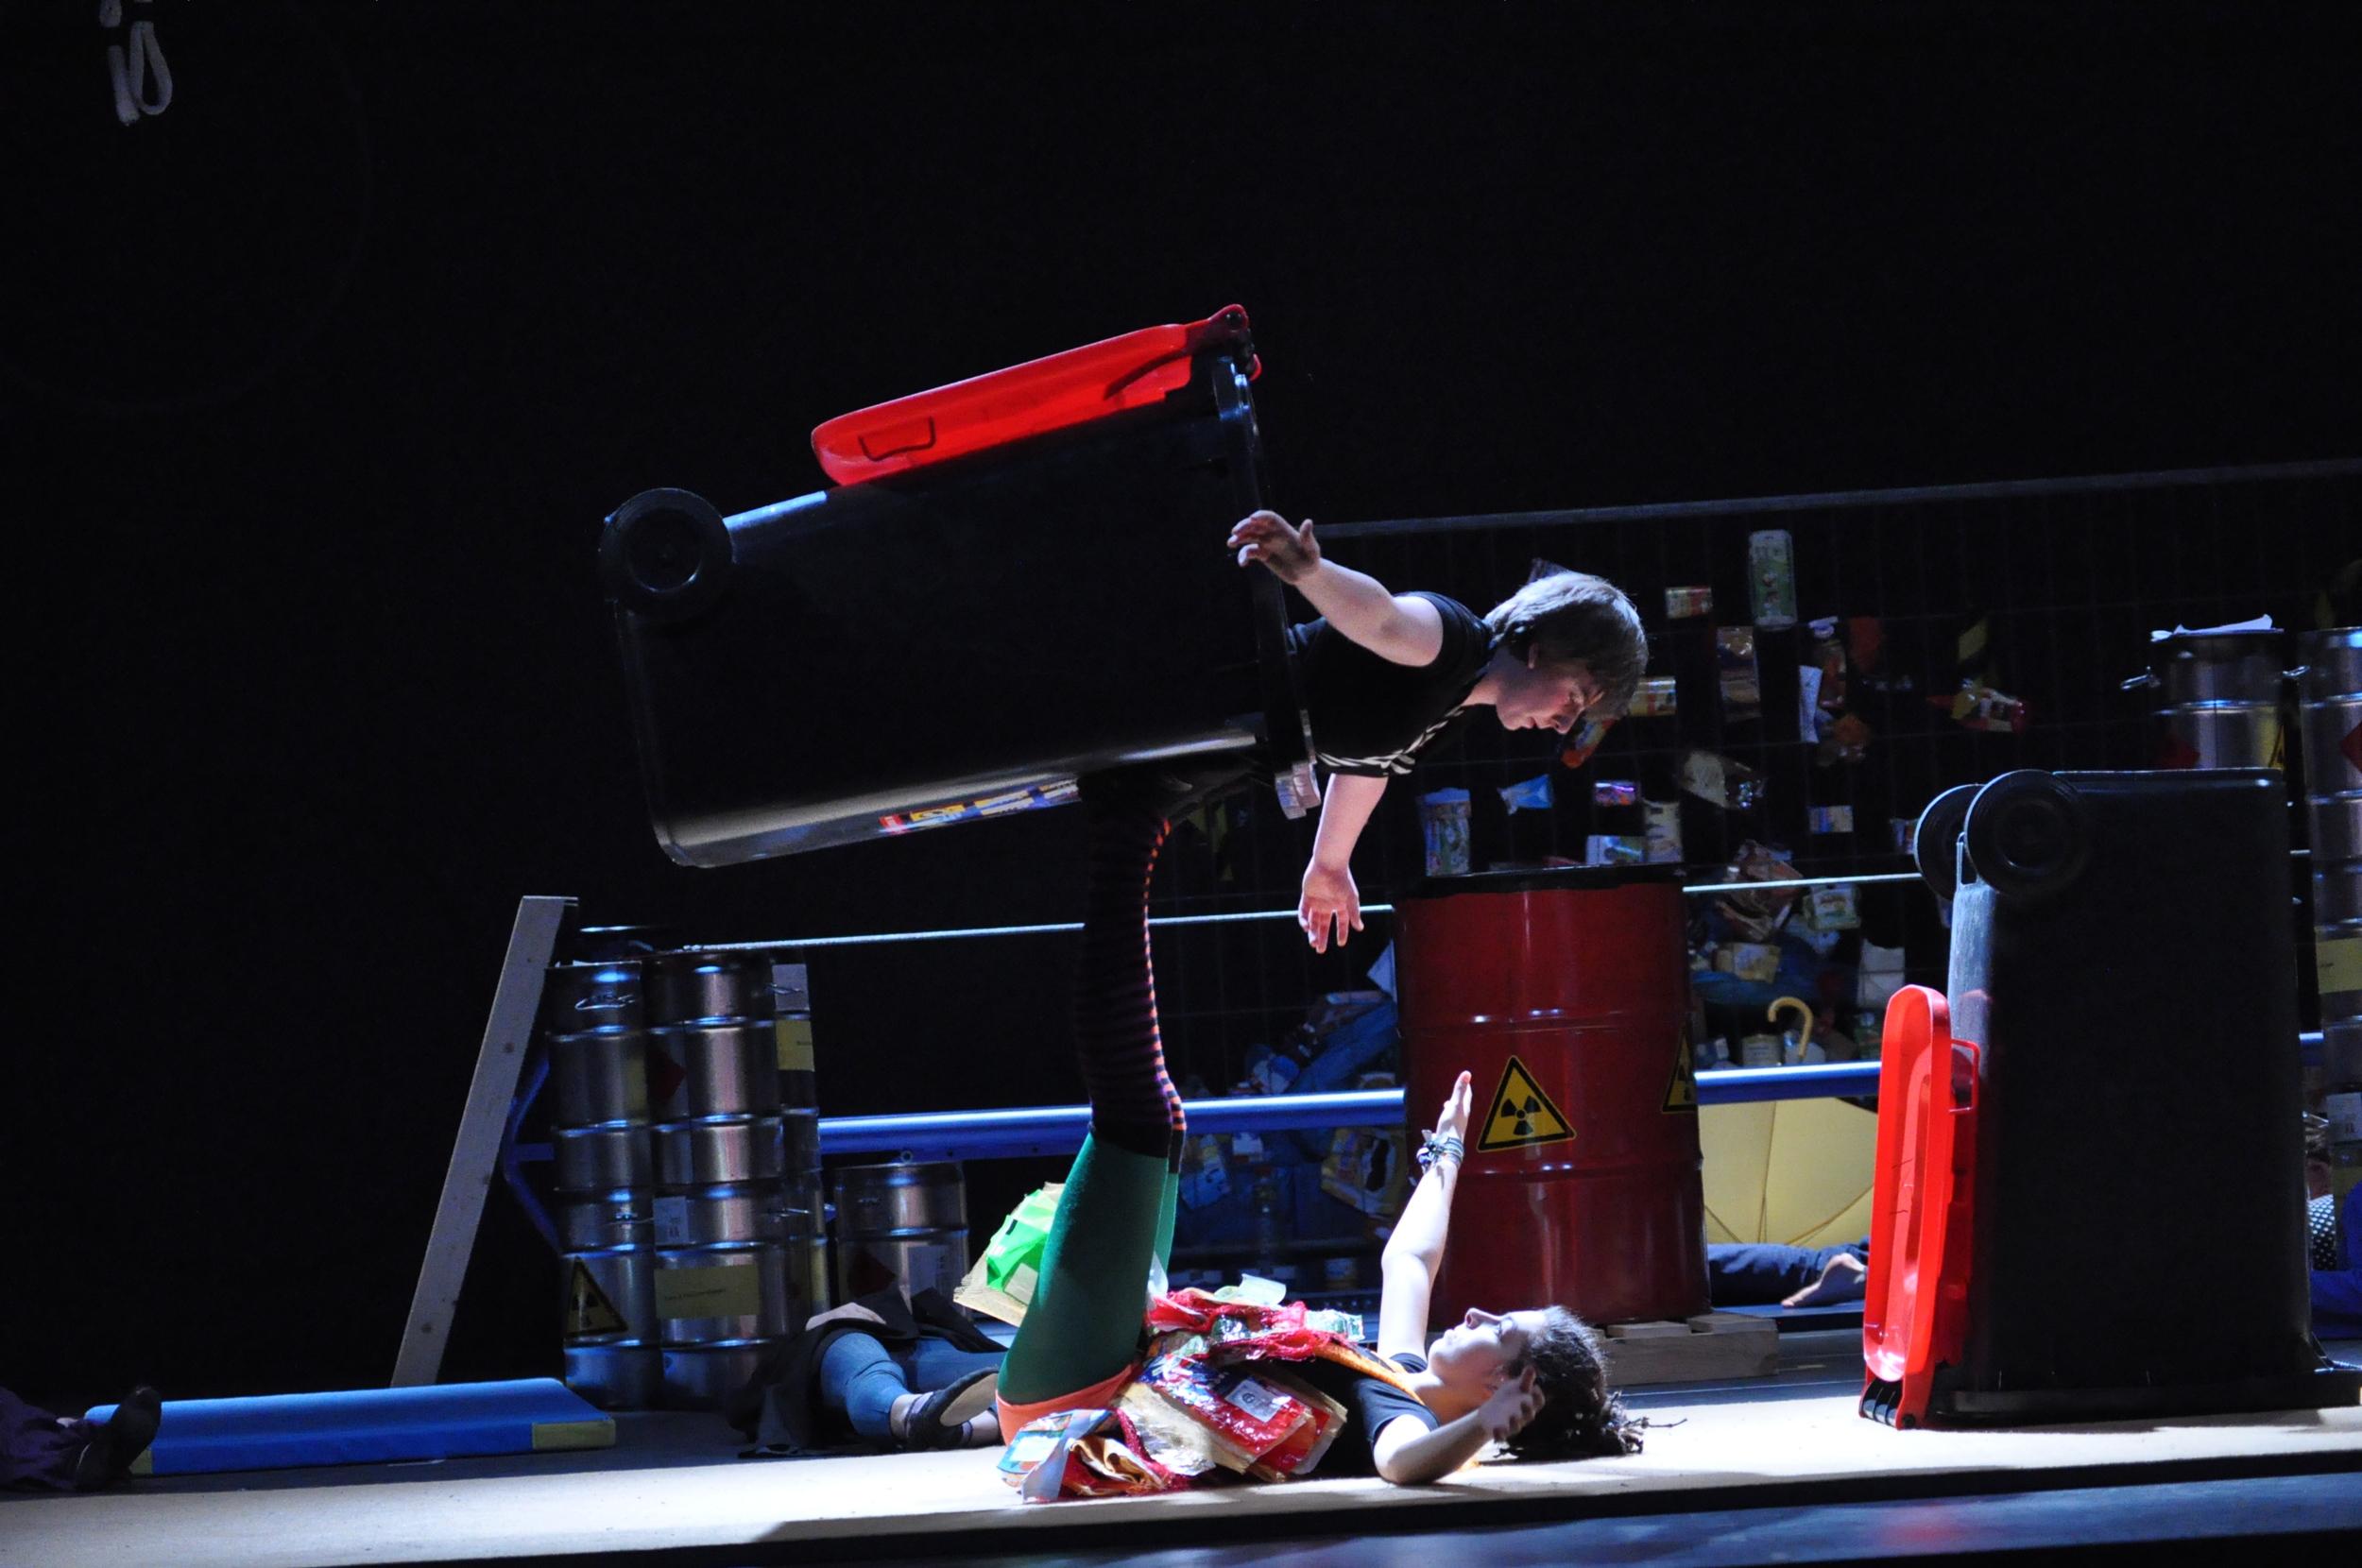 foto: Zirkus Maccaroni